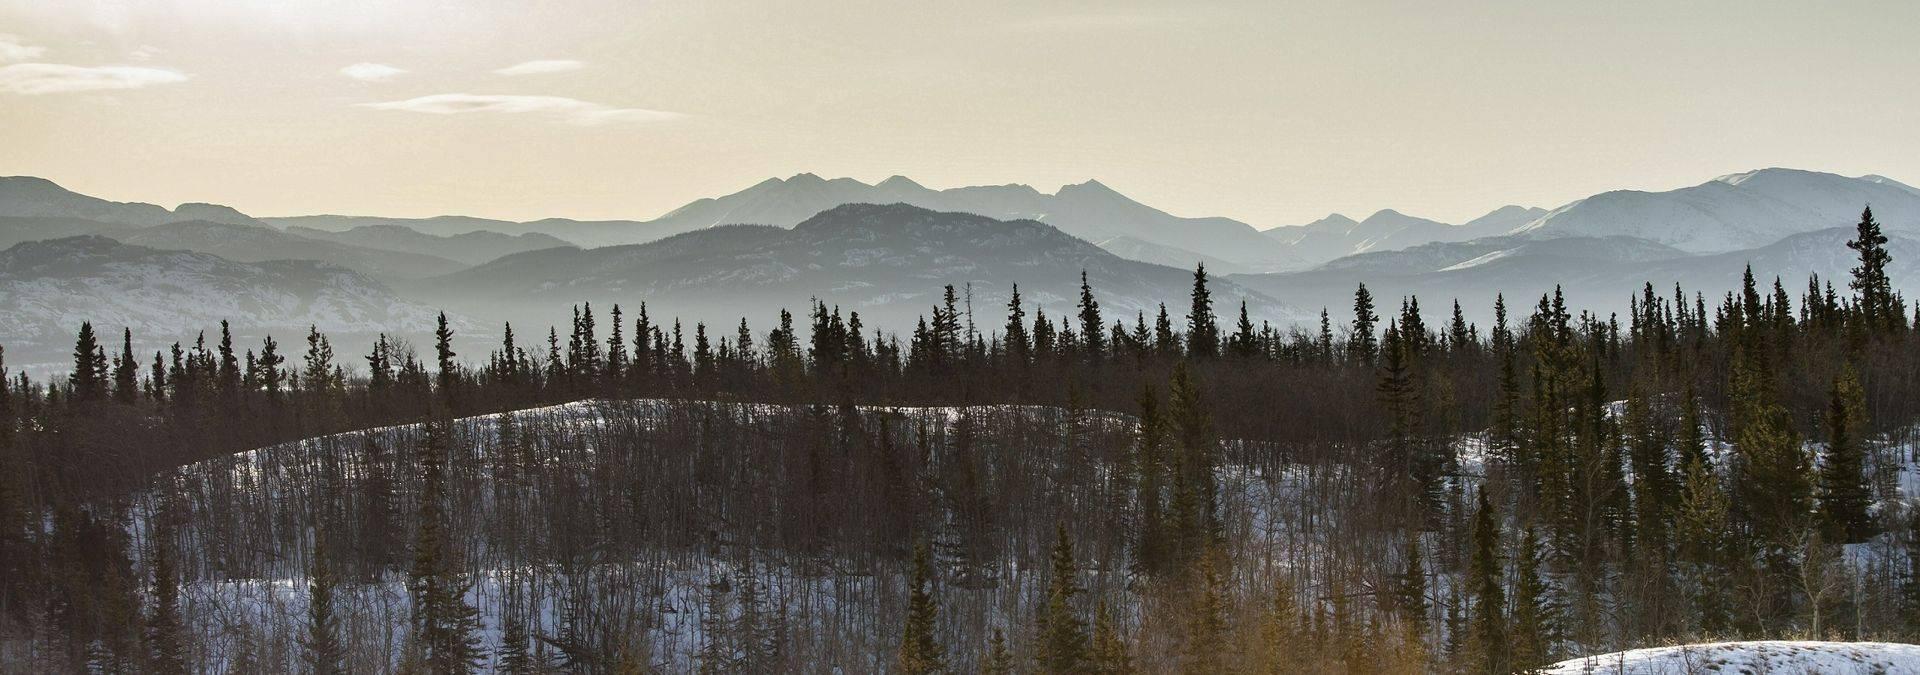 Klondike Highway   Yukon   Canadian Tourism Commission